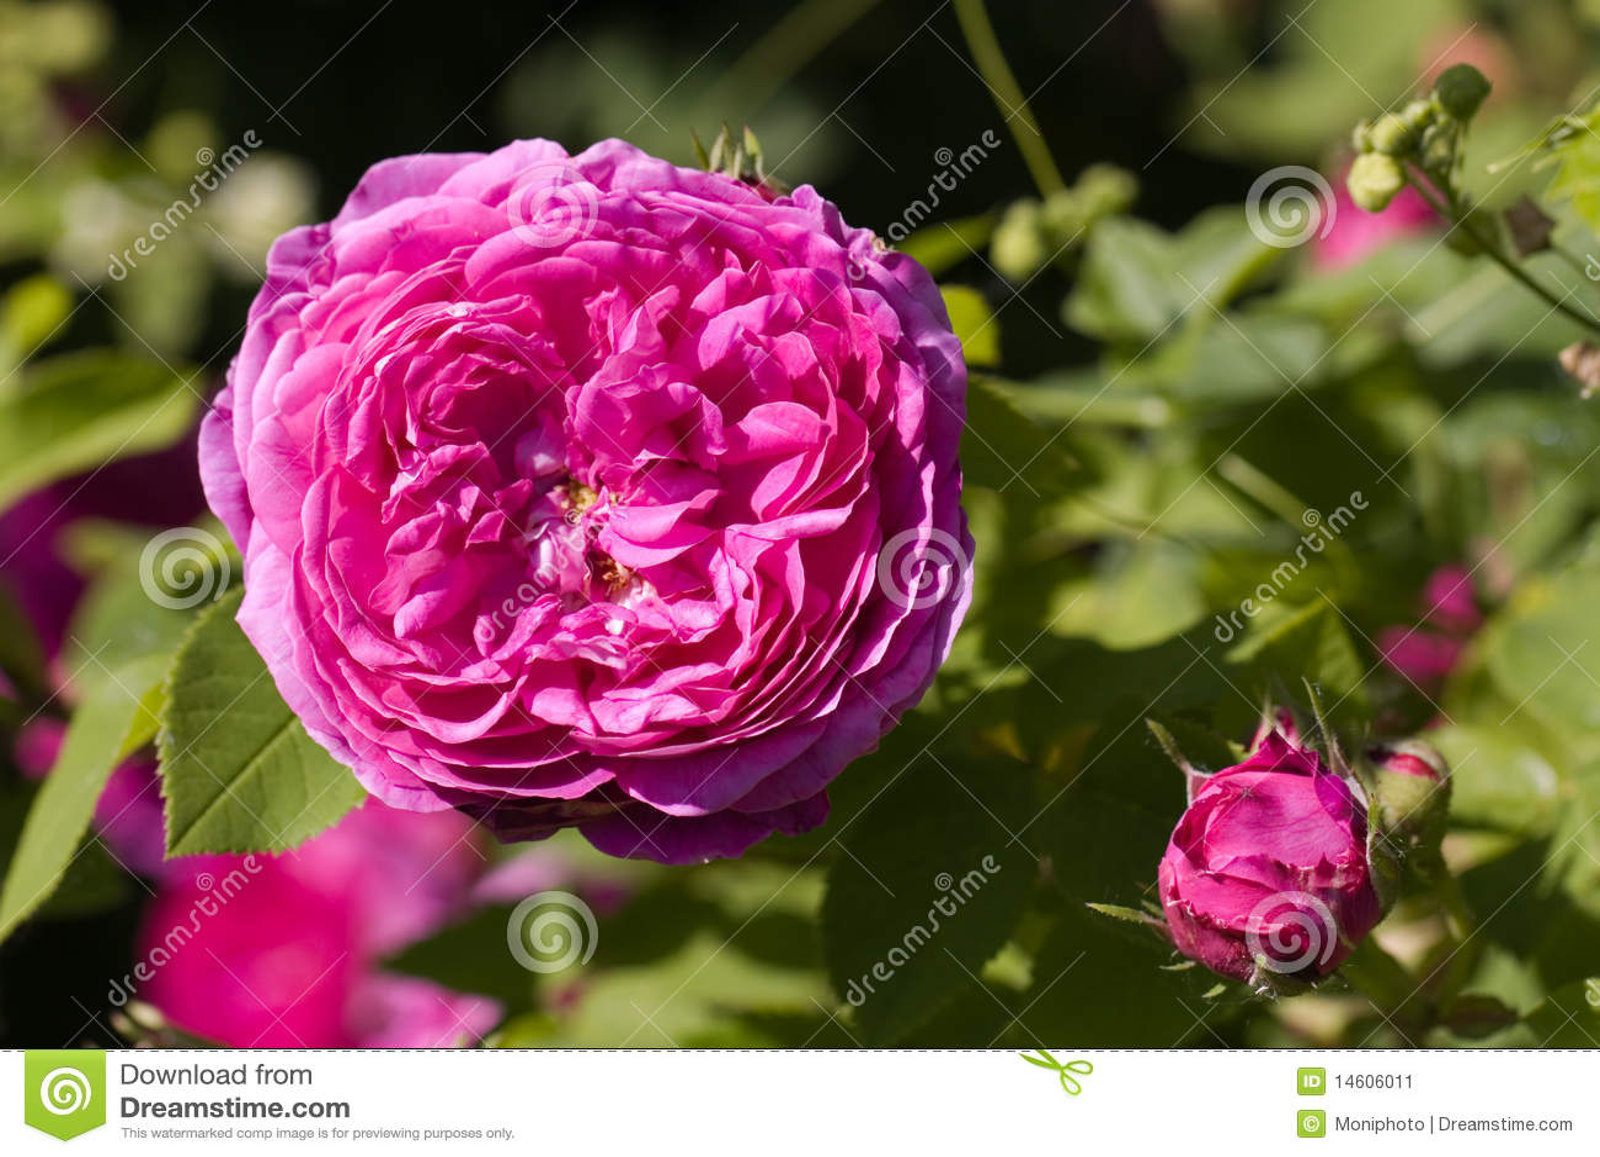 A Rose Perennial Flower Shrub Vine Of Genus Rosa Stock Image